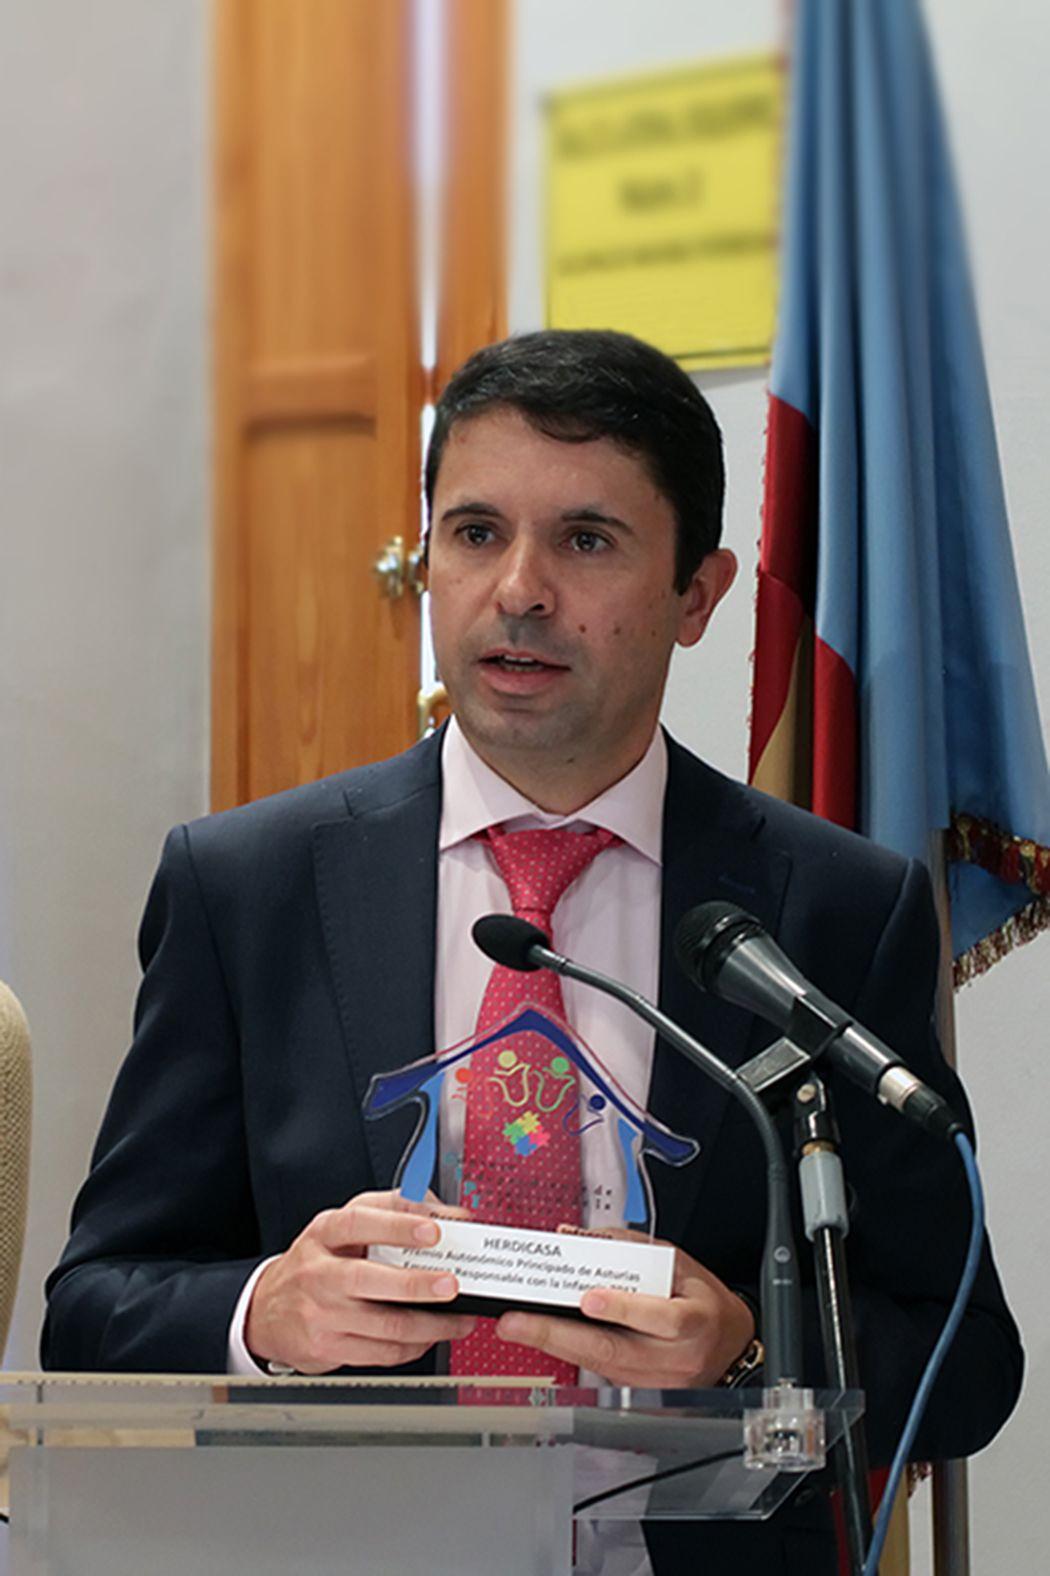 alt - https://static.comunicae.com/photos/notas/1191262/1511284351_Ruben_Garcia_recogiendo_premio_.jpg